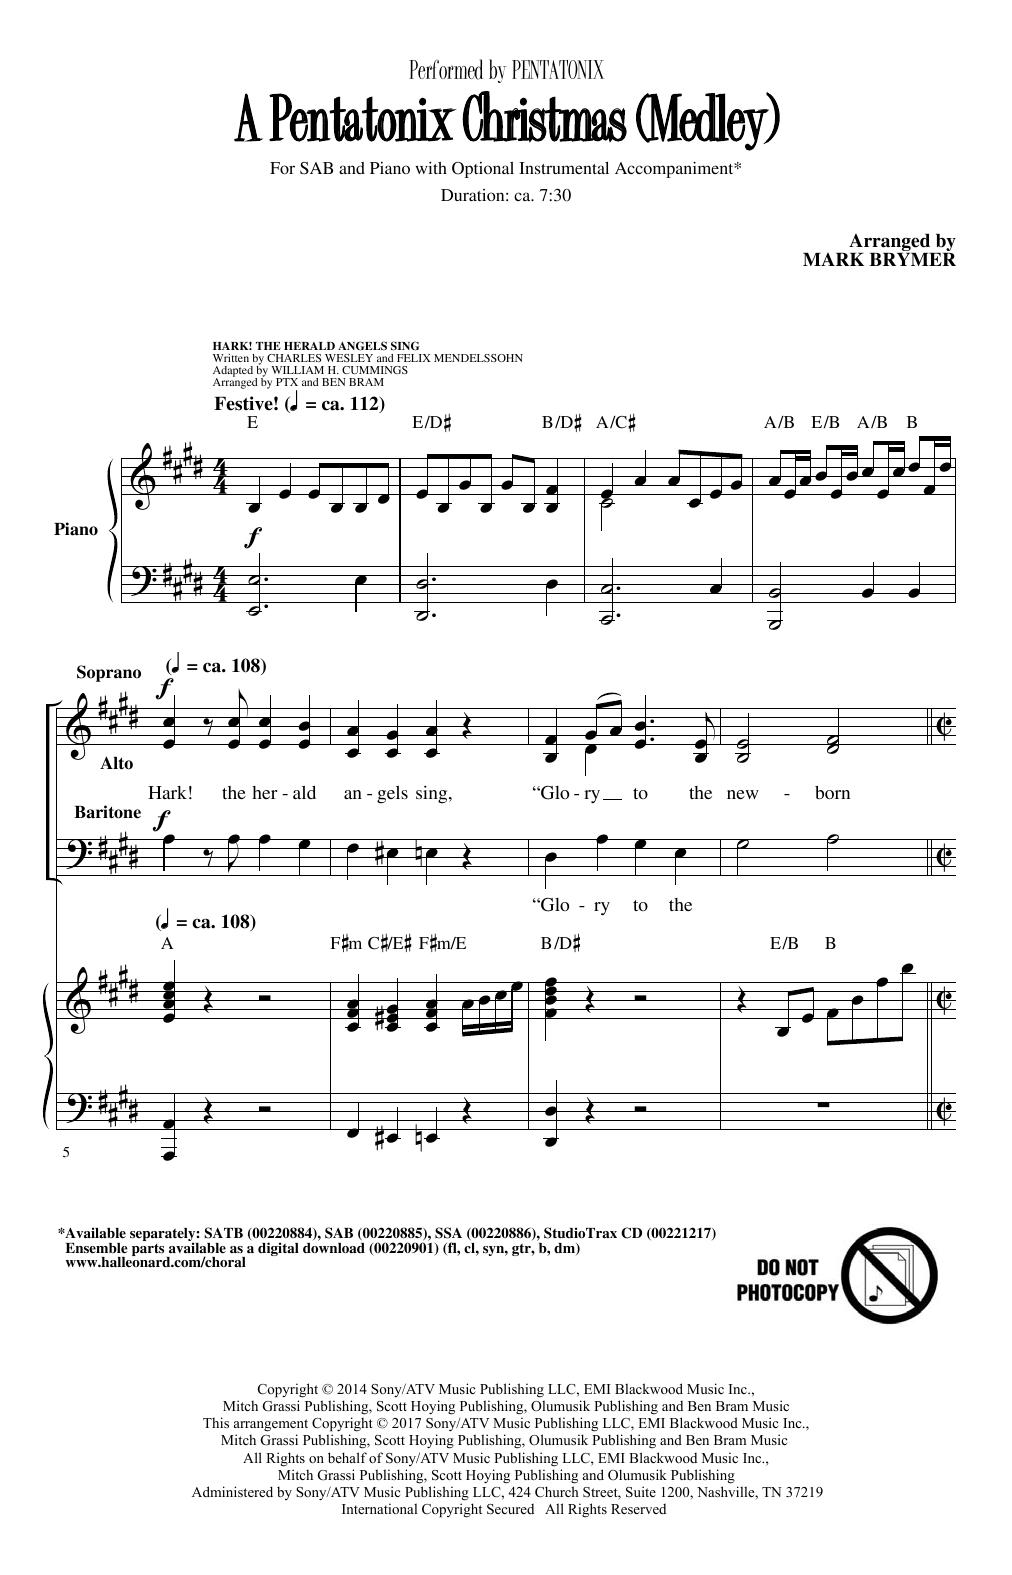 Hark! The Herald Angels Sing (arr. Mark Brymer) Sheet Music